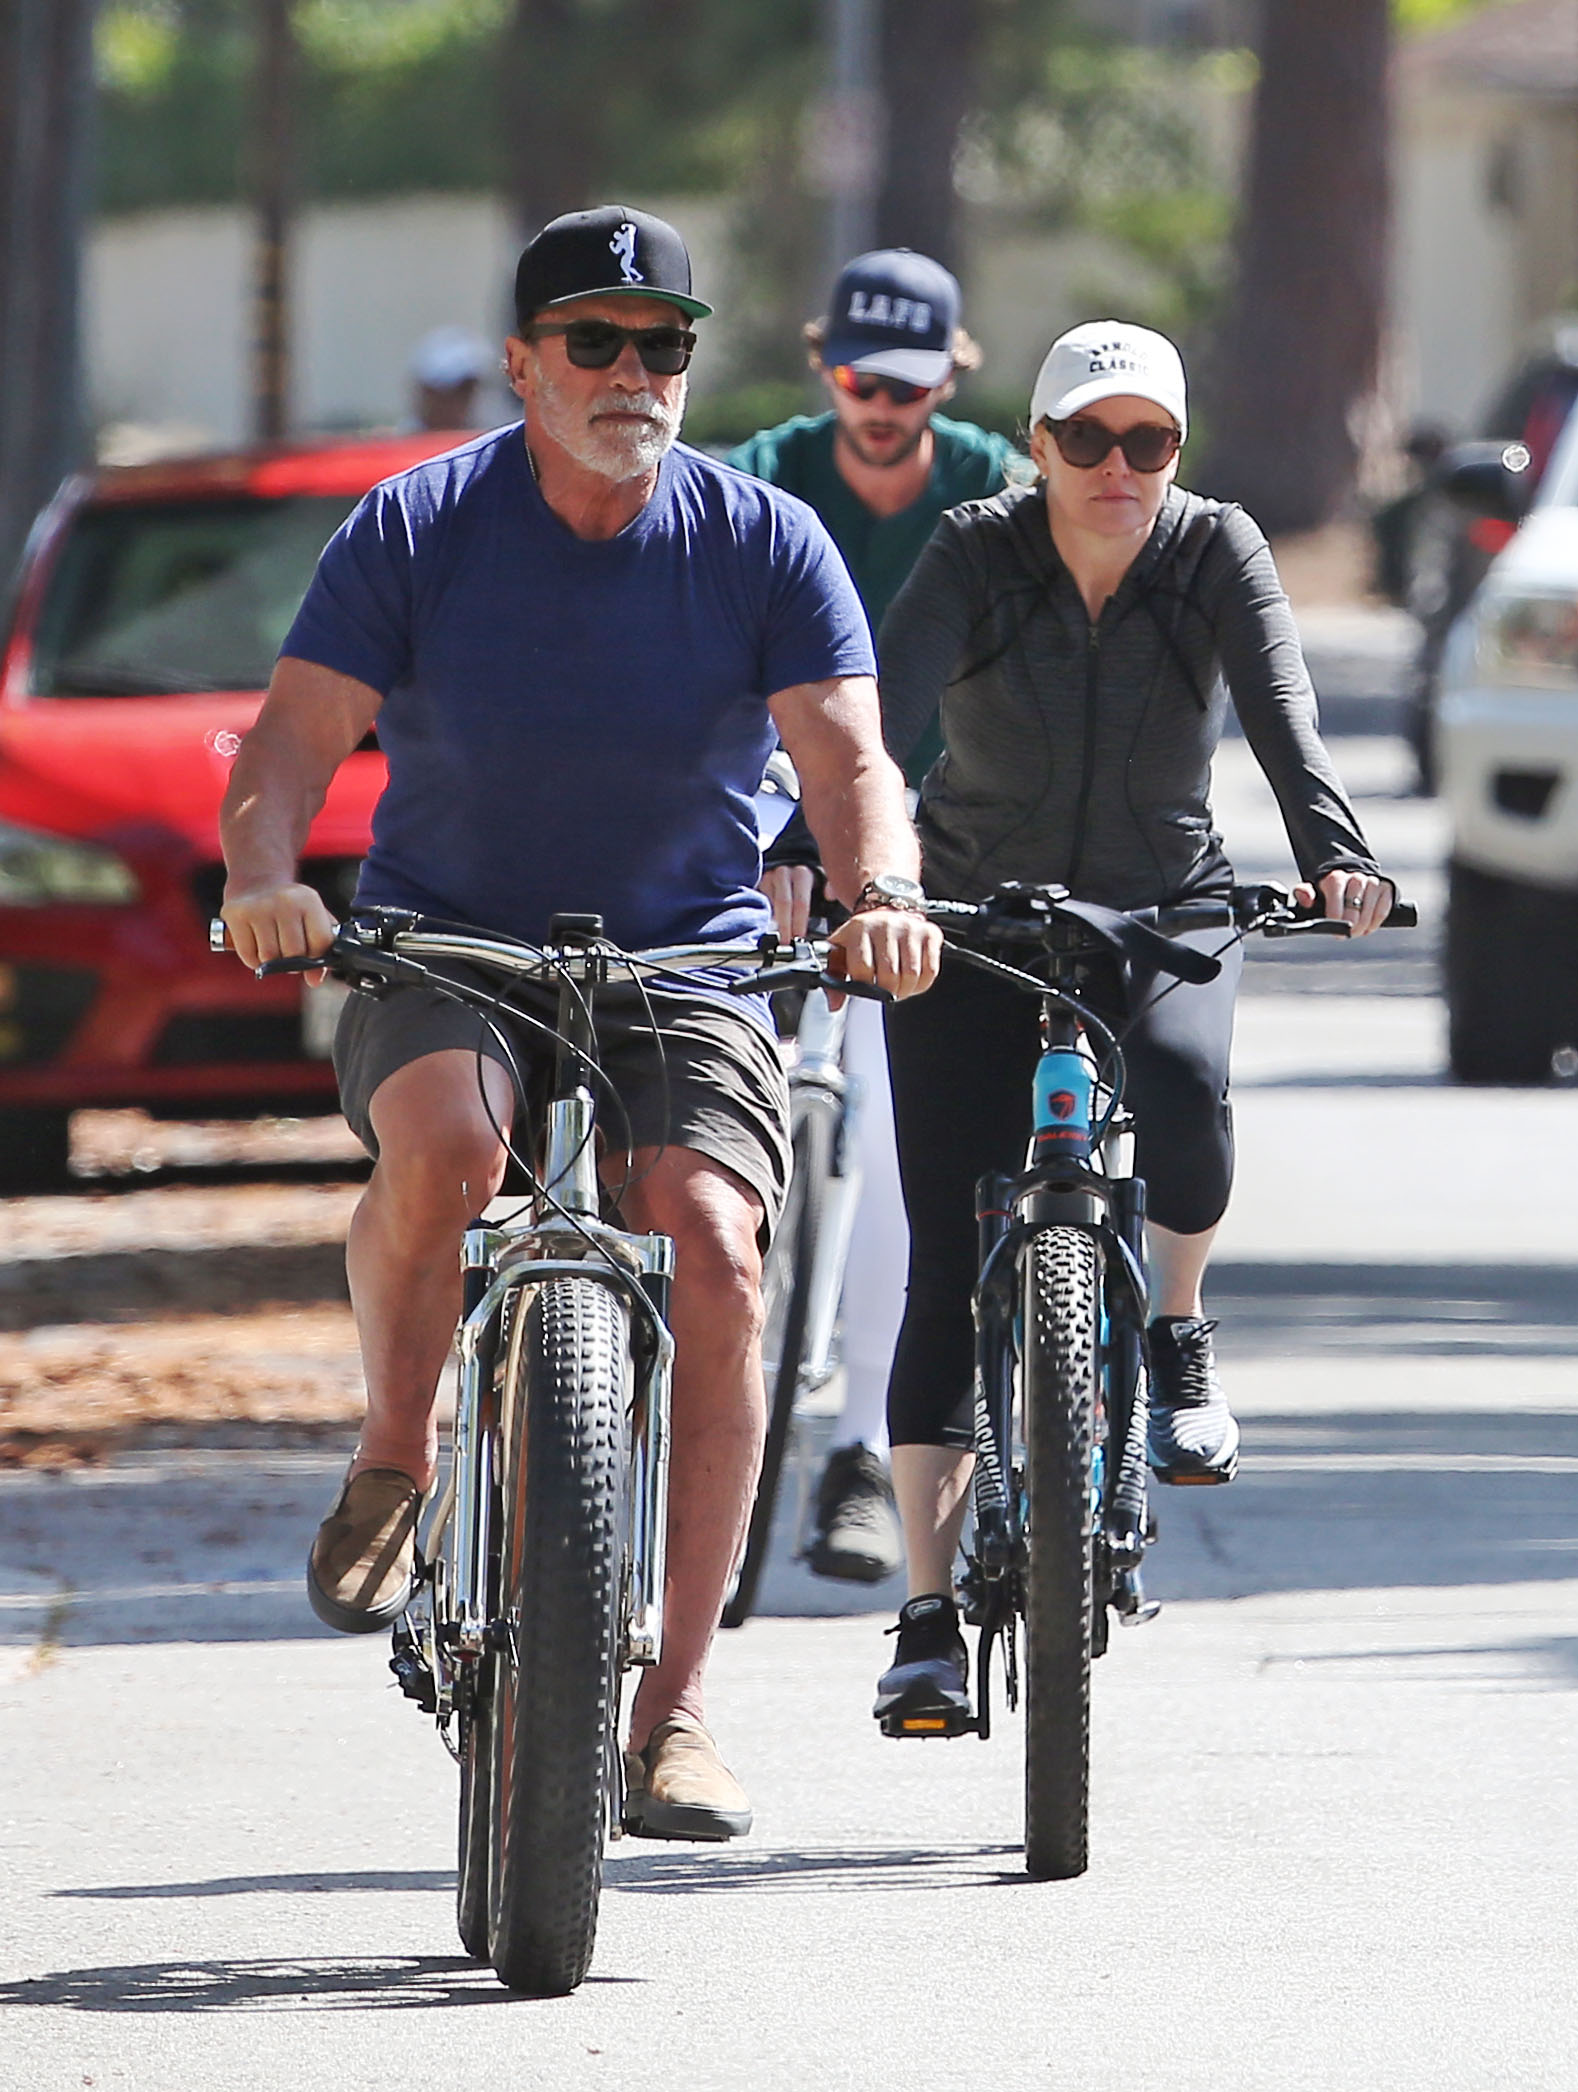 Arnold Schwarzenegger and Patrick Schwarzenegger bike rides